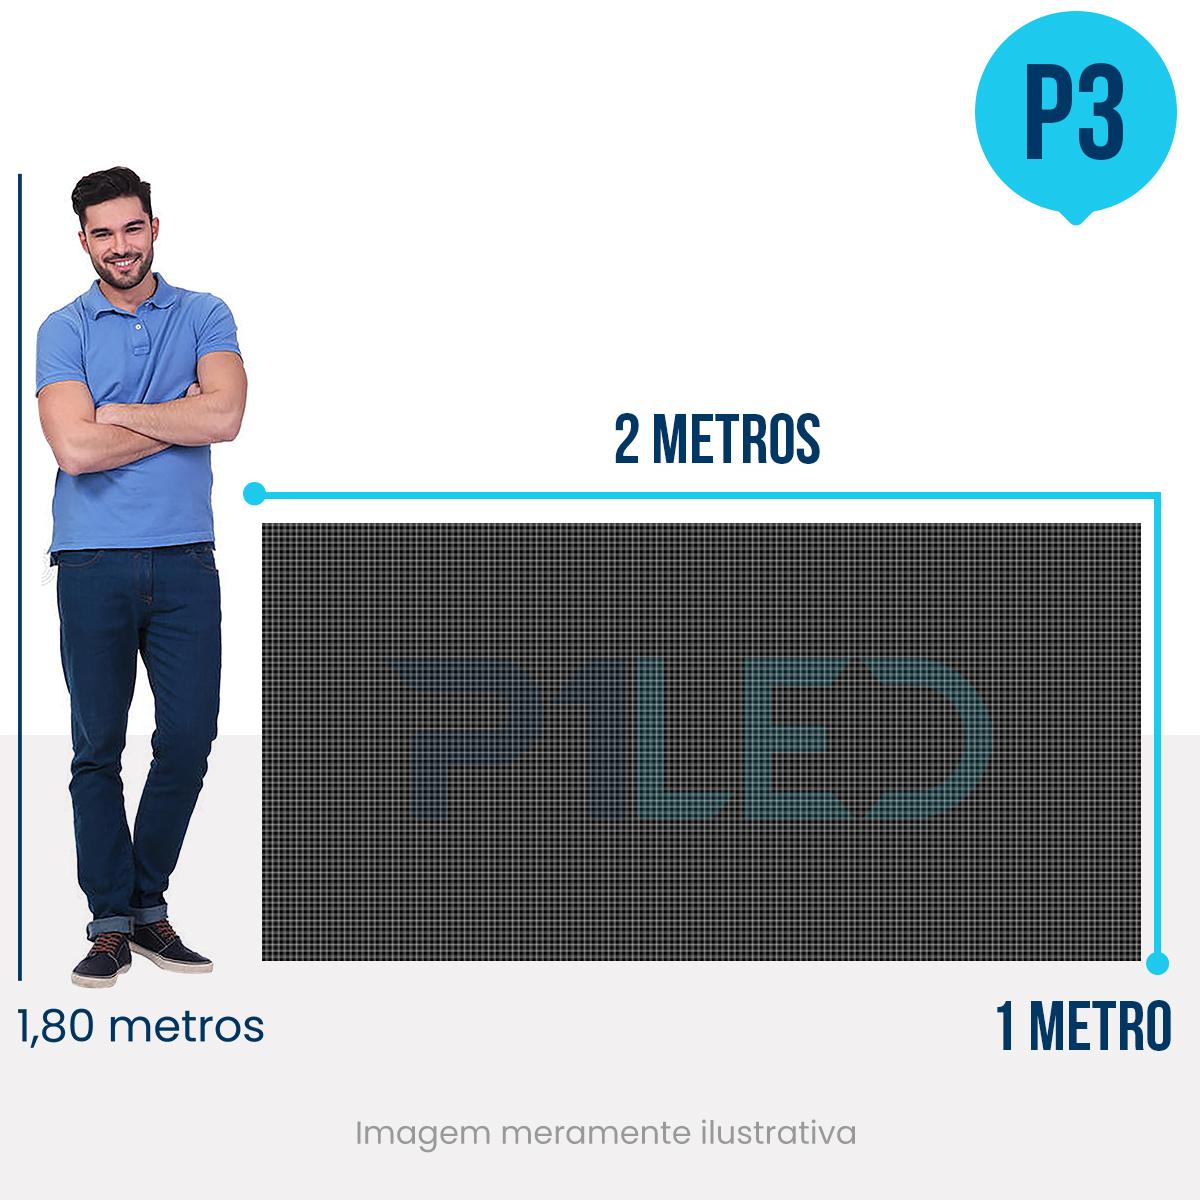 Painel de LED para Shopping 2x1 - Telão P3 Indoor  - Painel e Telão de LED - O Melhor Preço em Painel de LED | P1LED